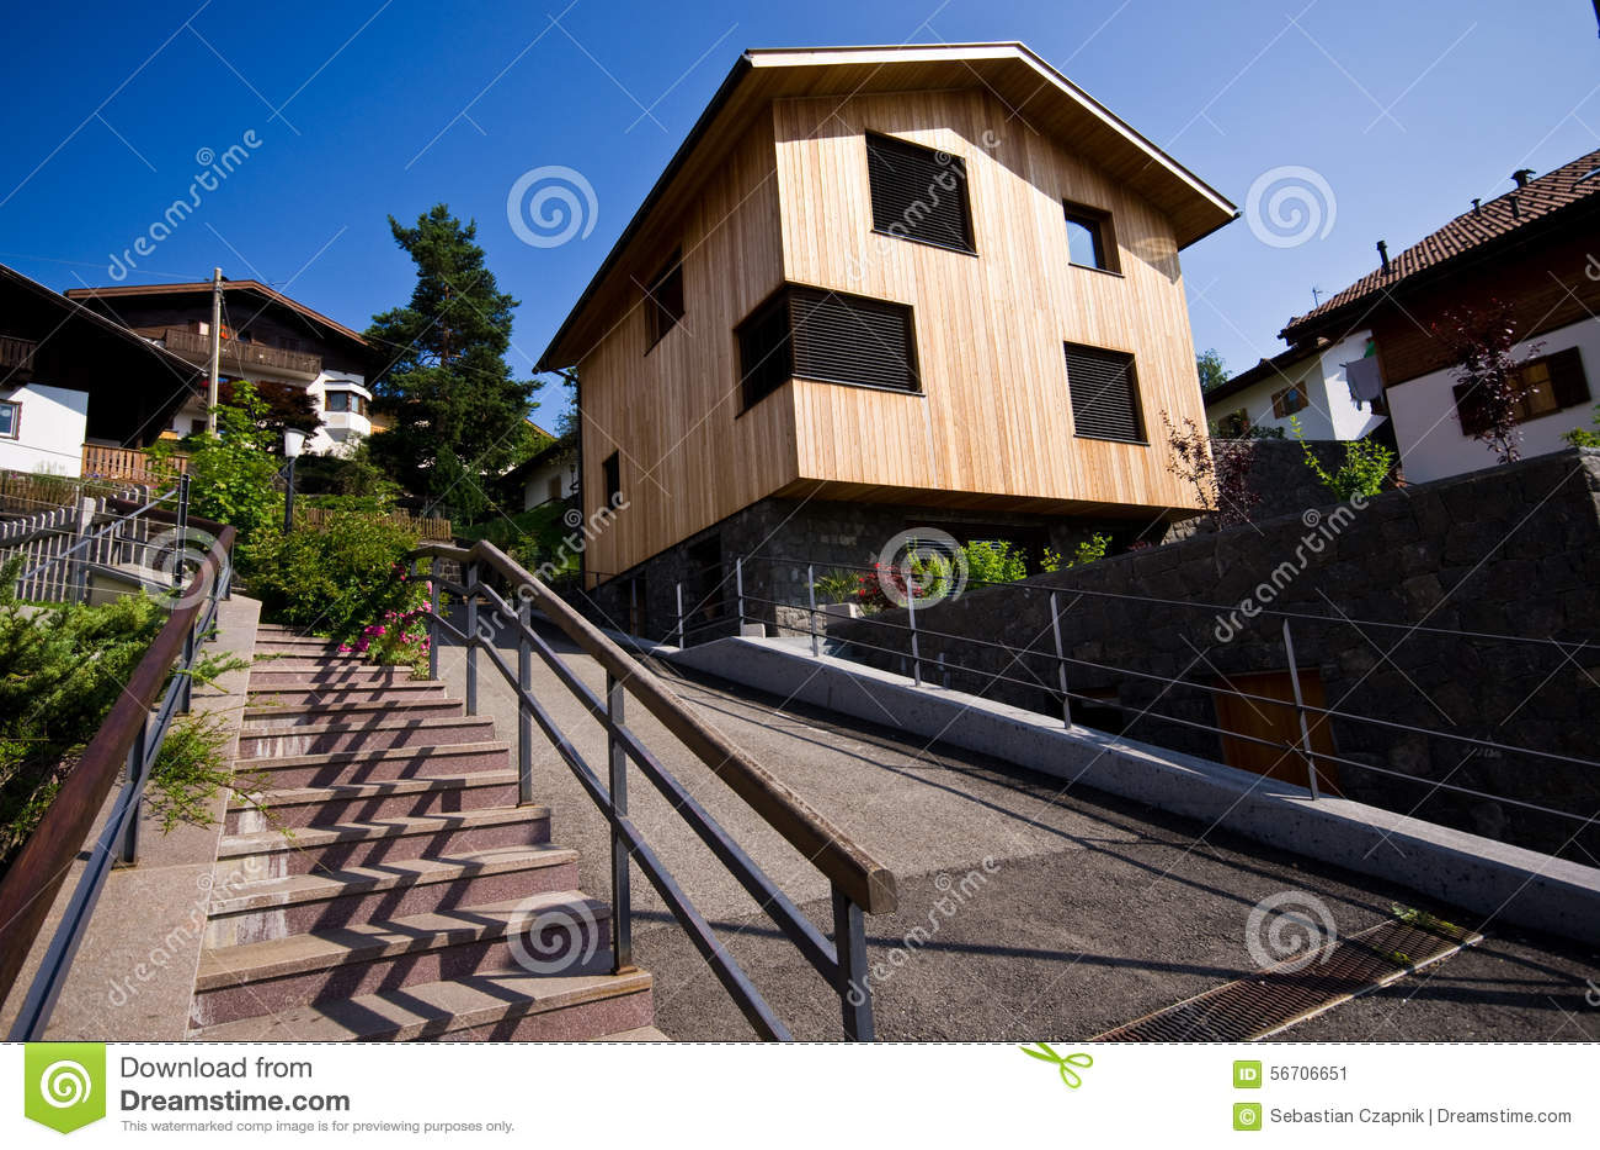 Modernes holzhaus in den italienischen alpen stockfoto for Modernes holzhaus